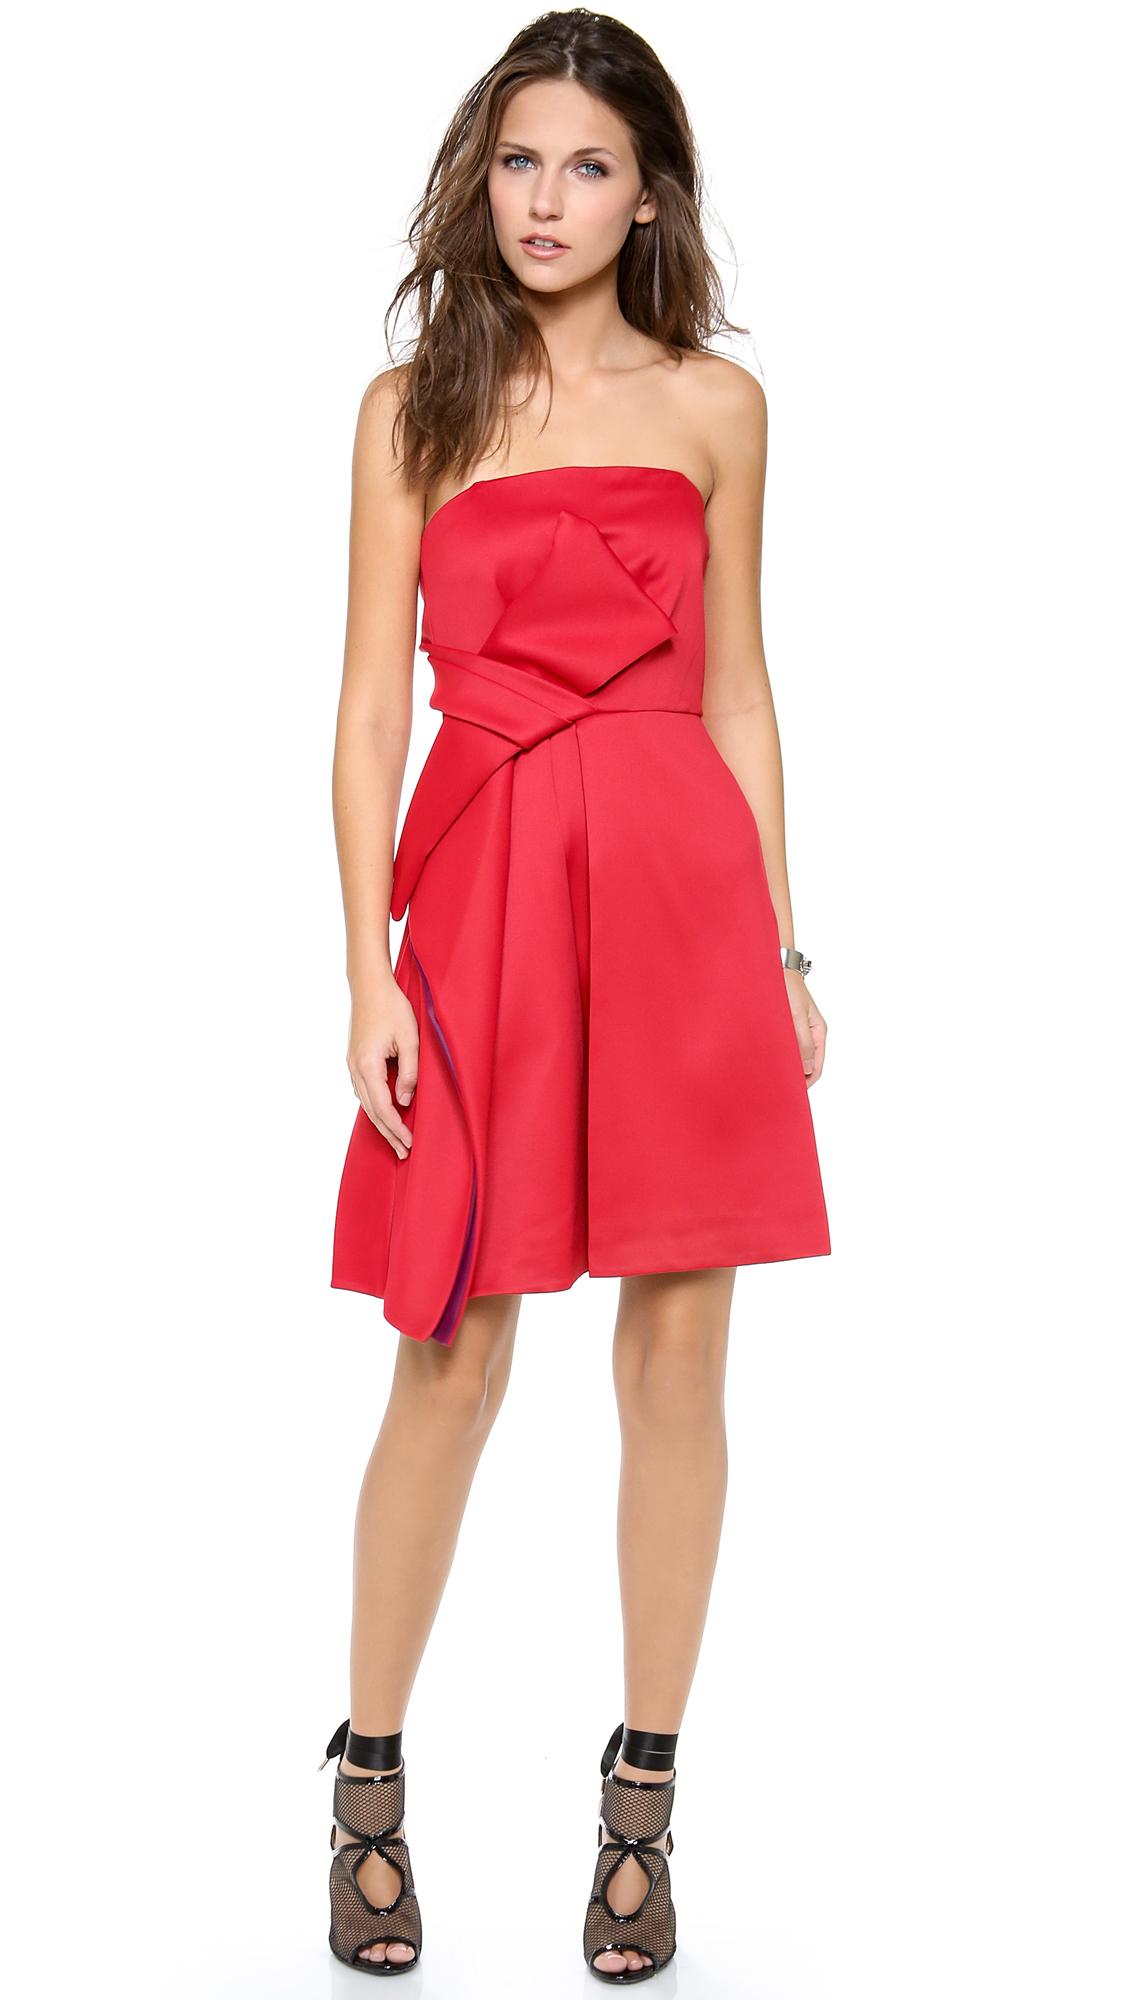 Halston Heritage Strapless Colorblock Bow Dress - SHOPBOP